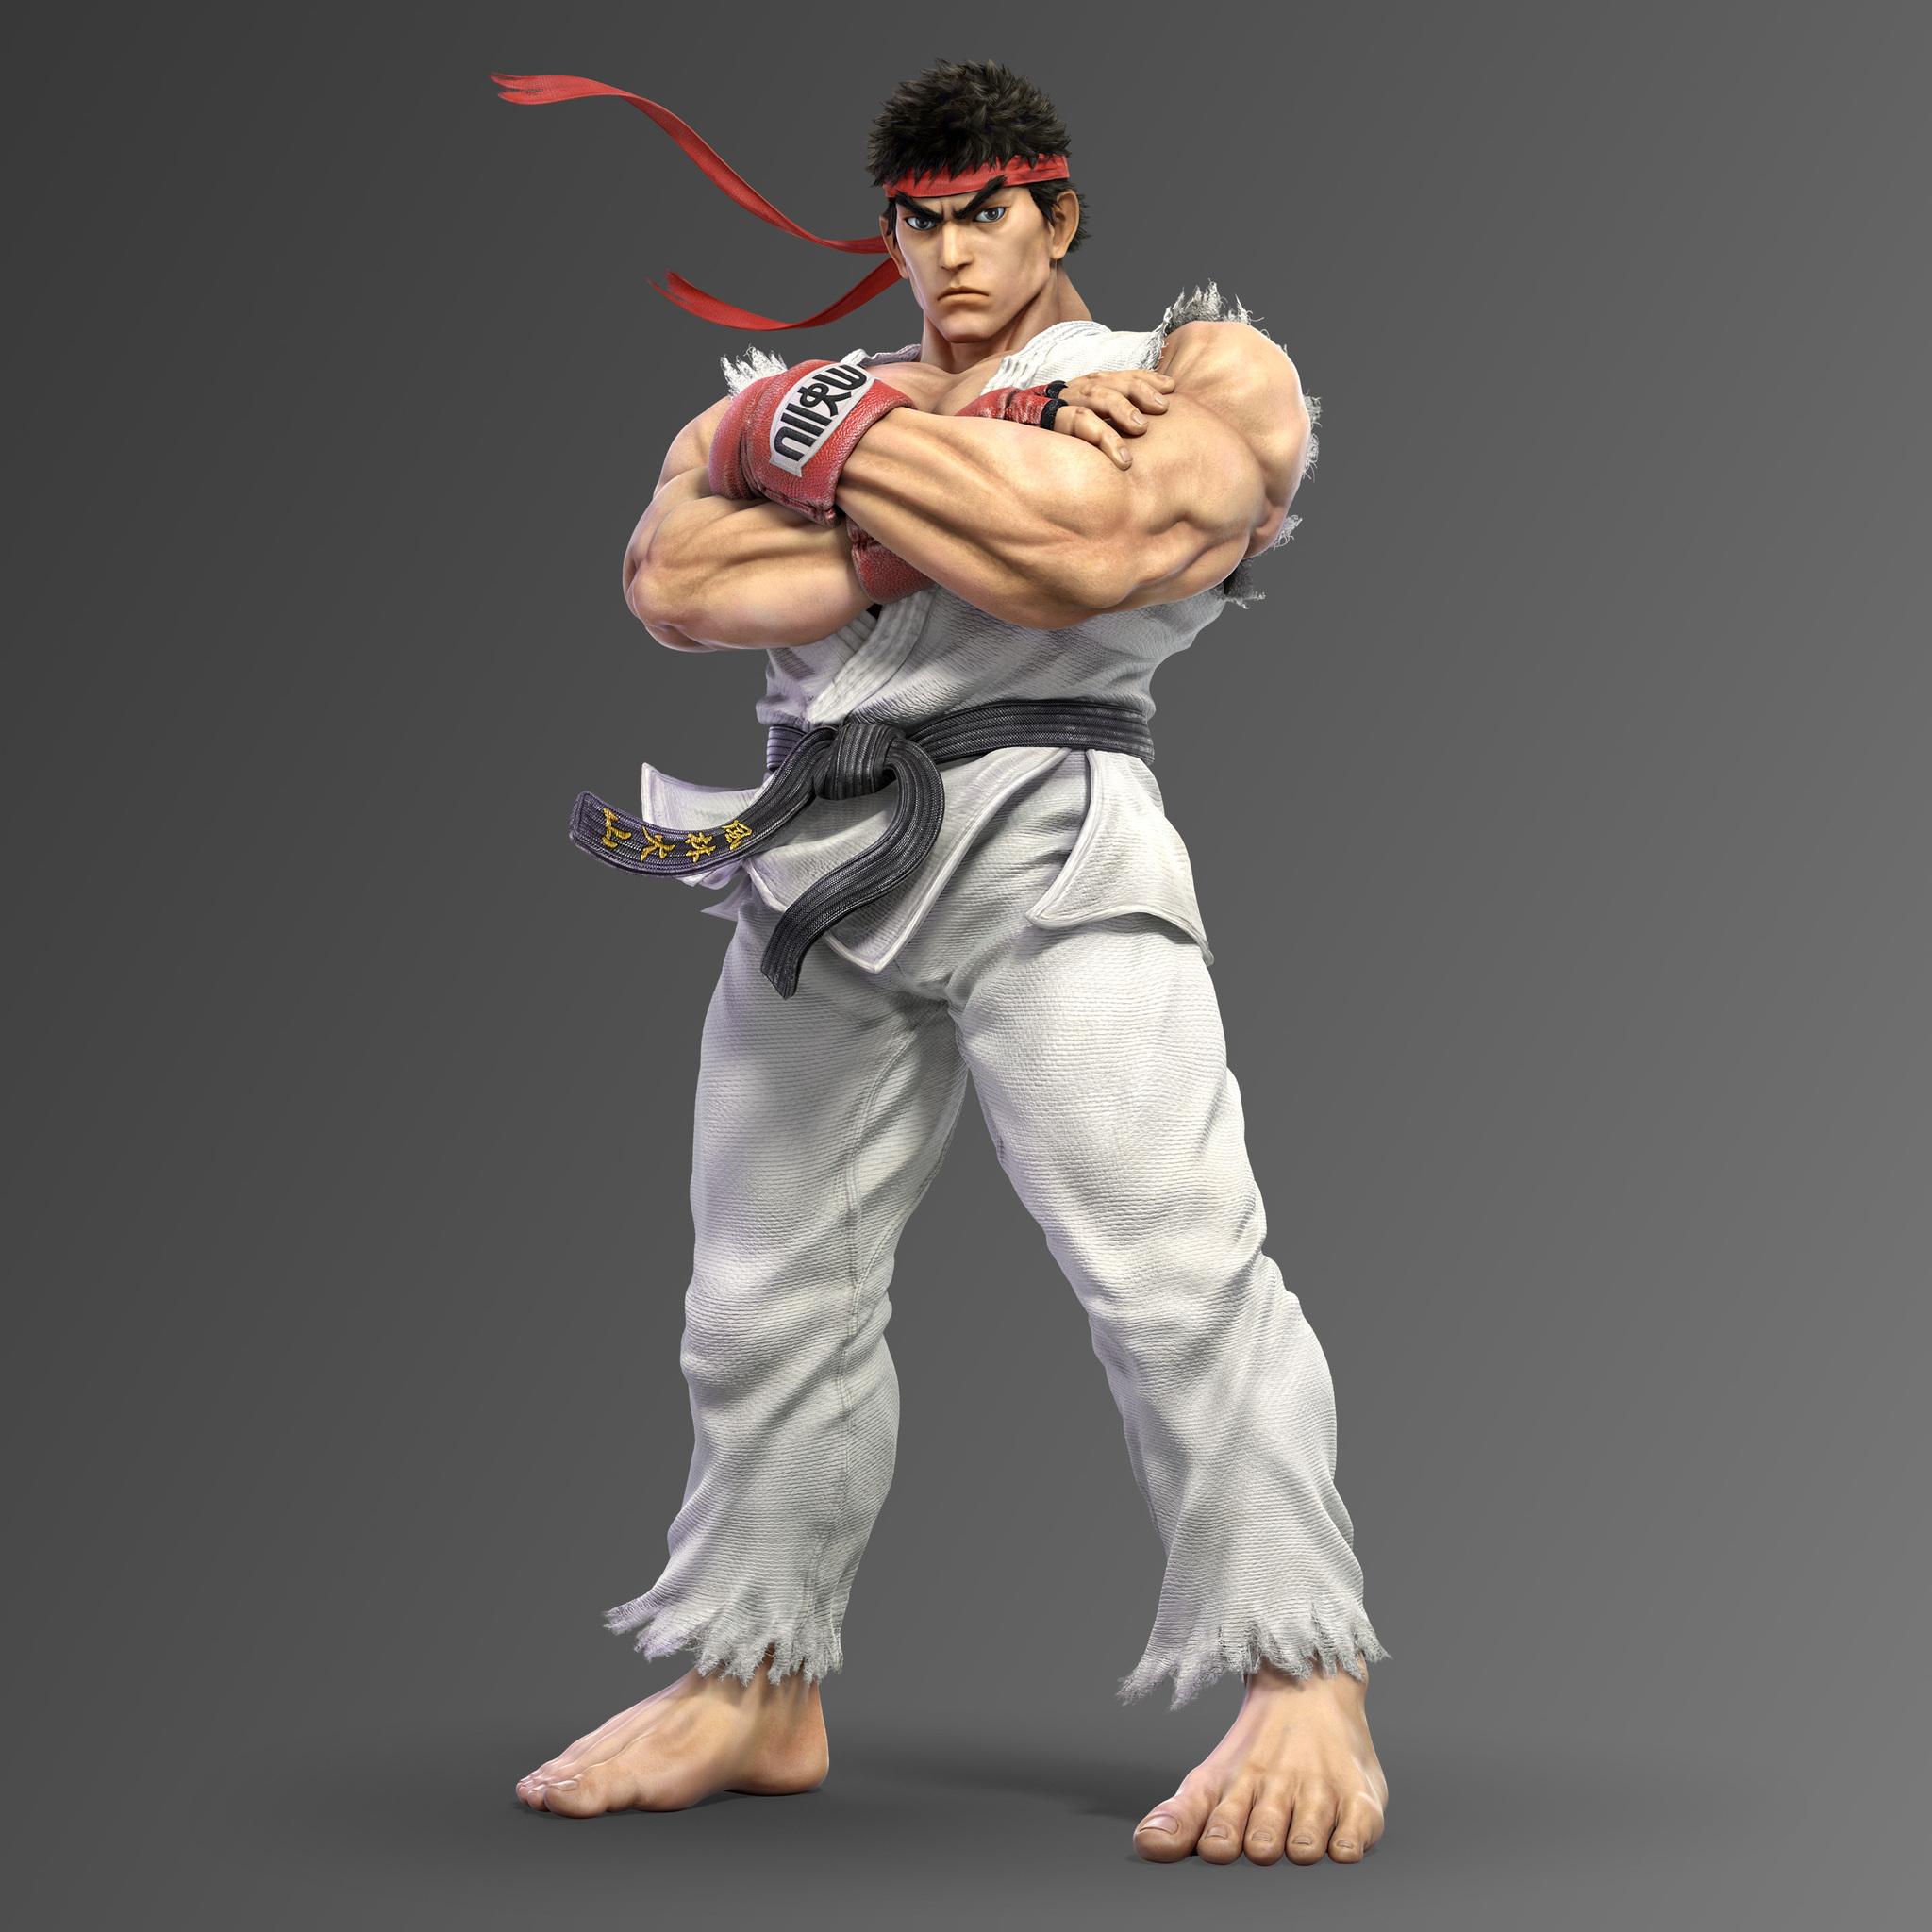 ryu-super-smash-bros-ultimate-5k-yc.jpg